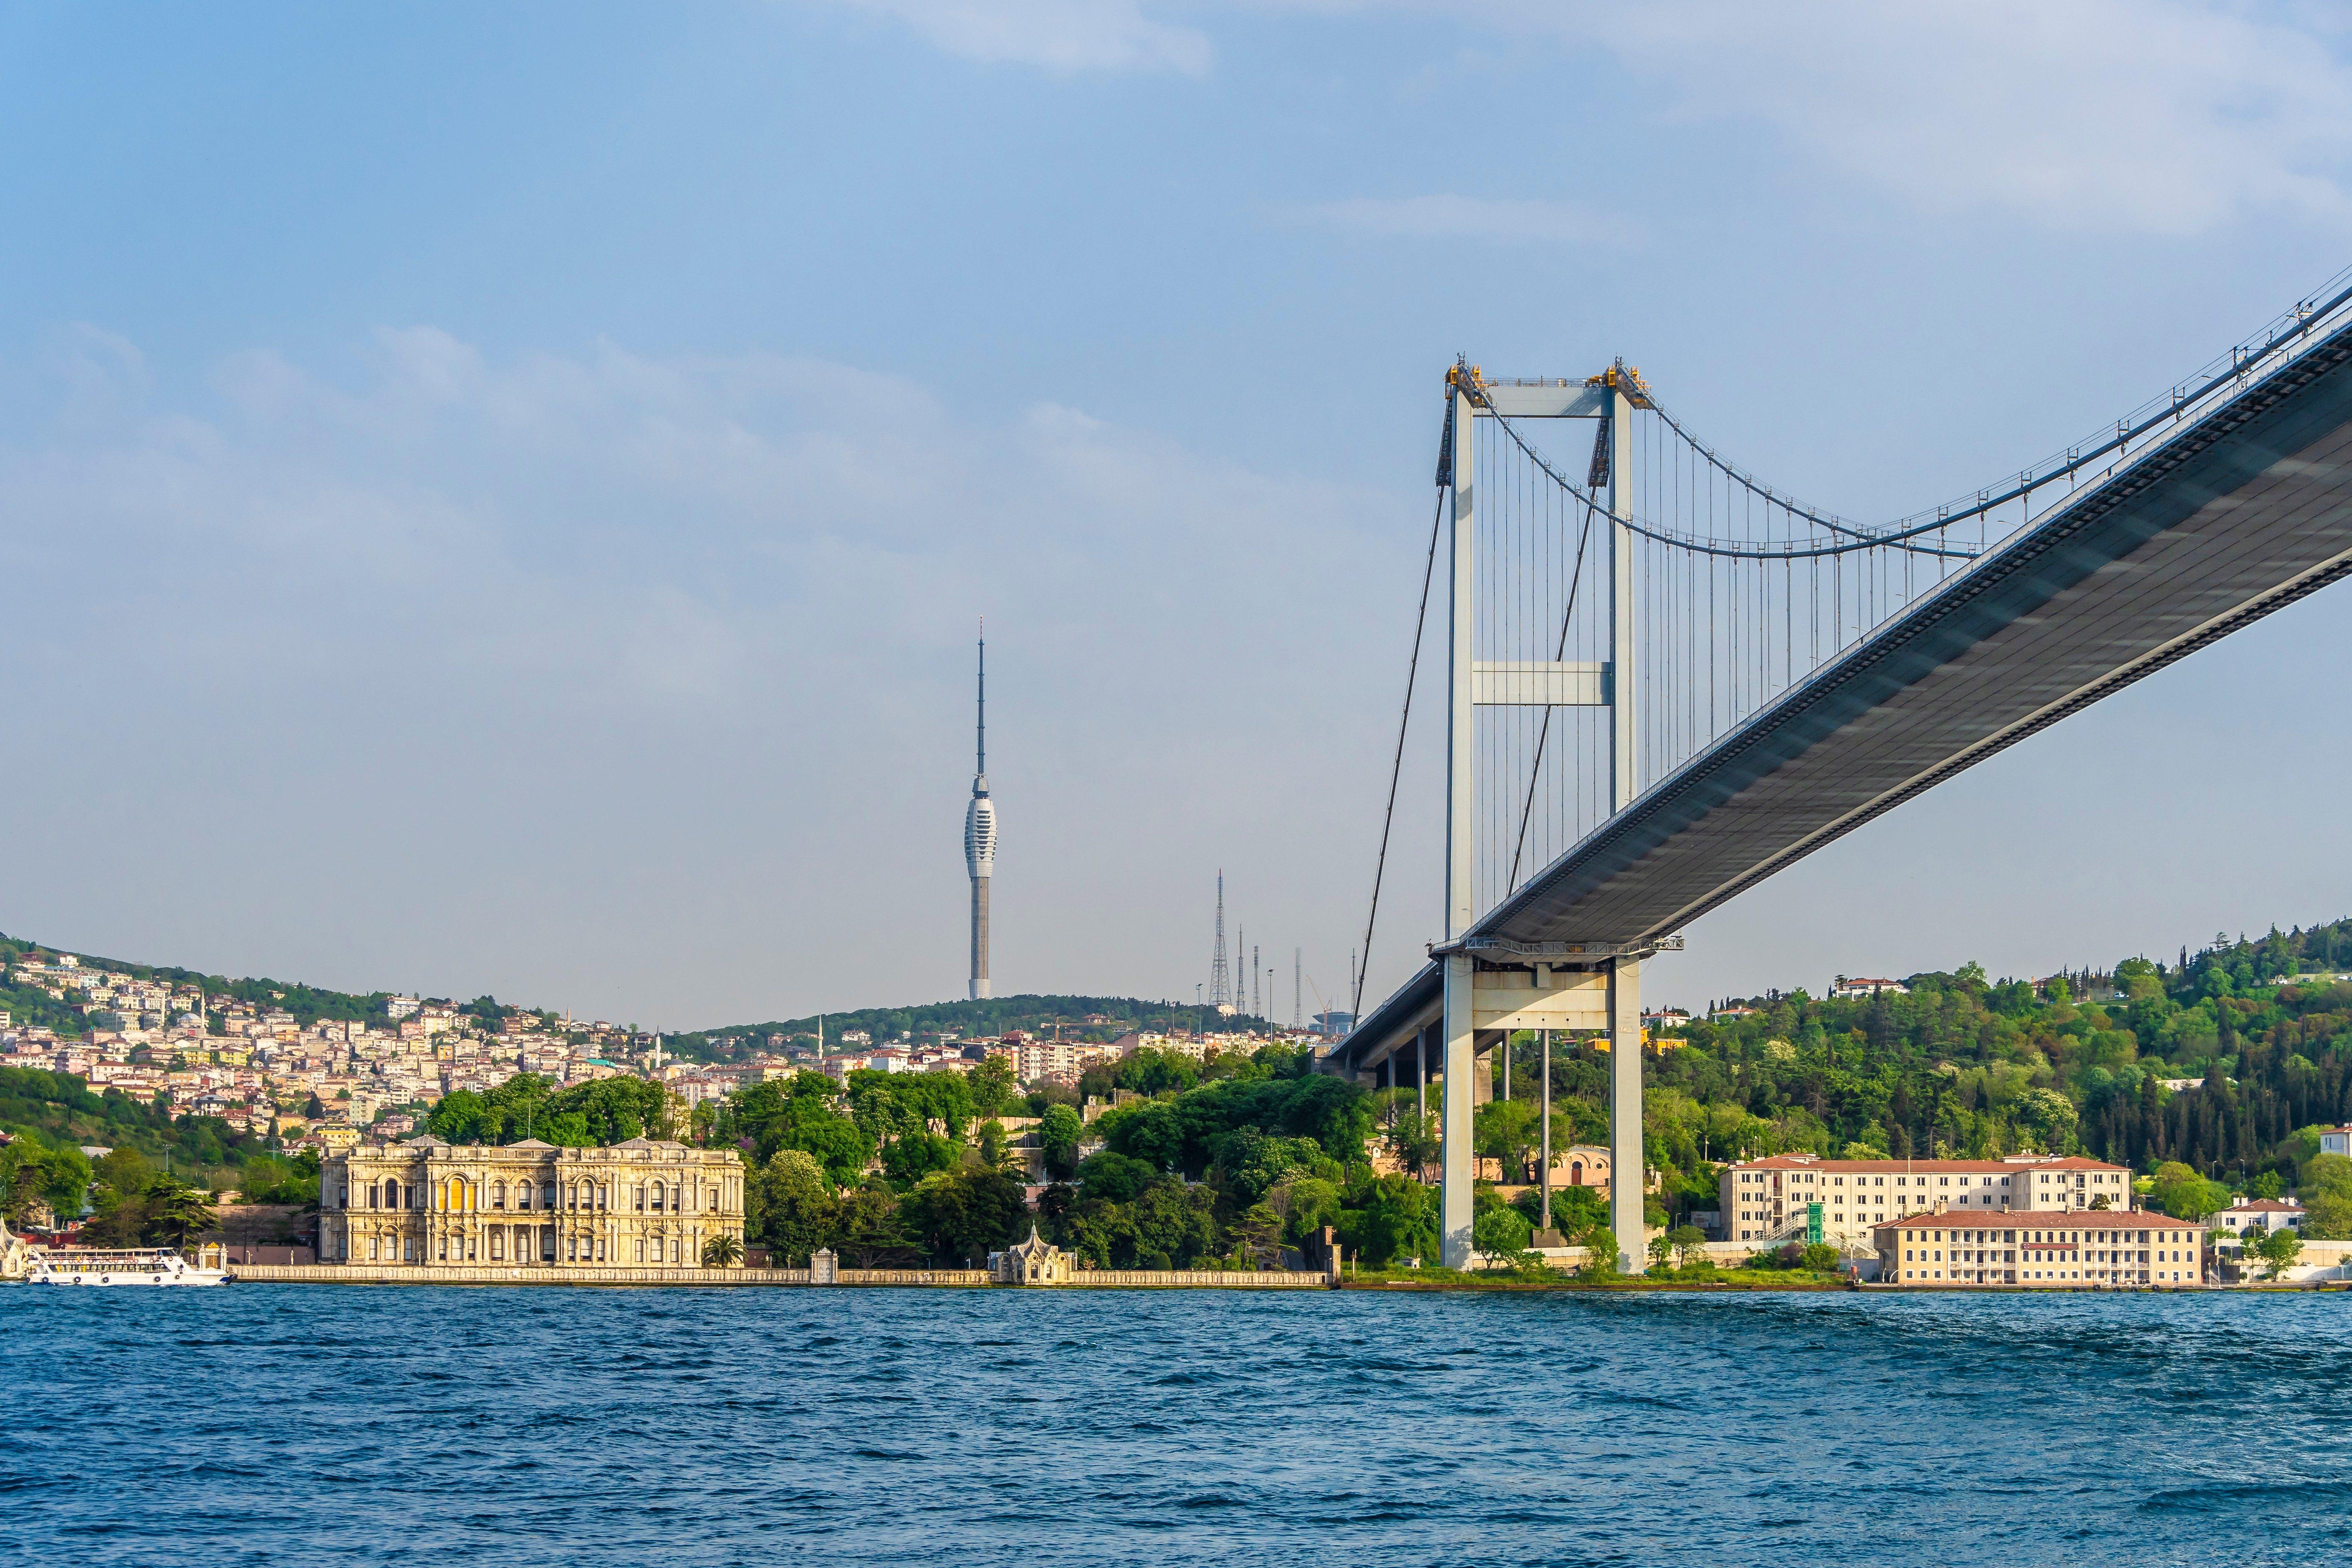 Beylerbeyi Palace under 15 July Martyrs Bridge in Istanbul